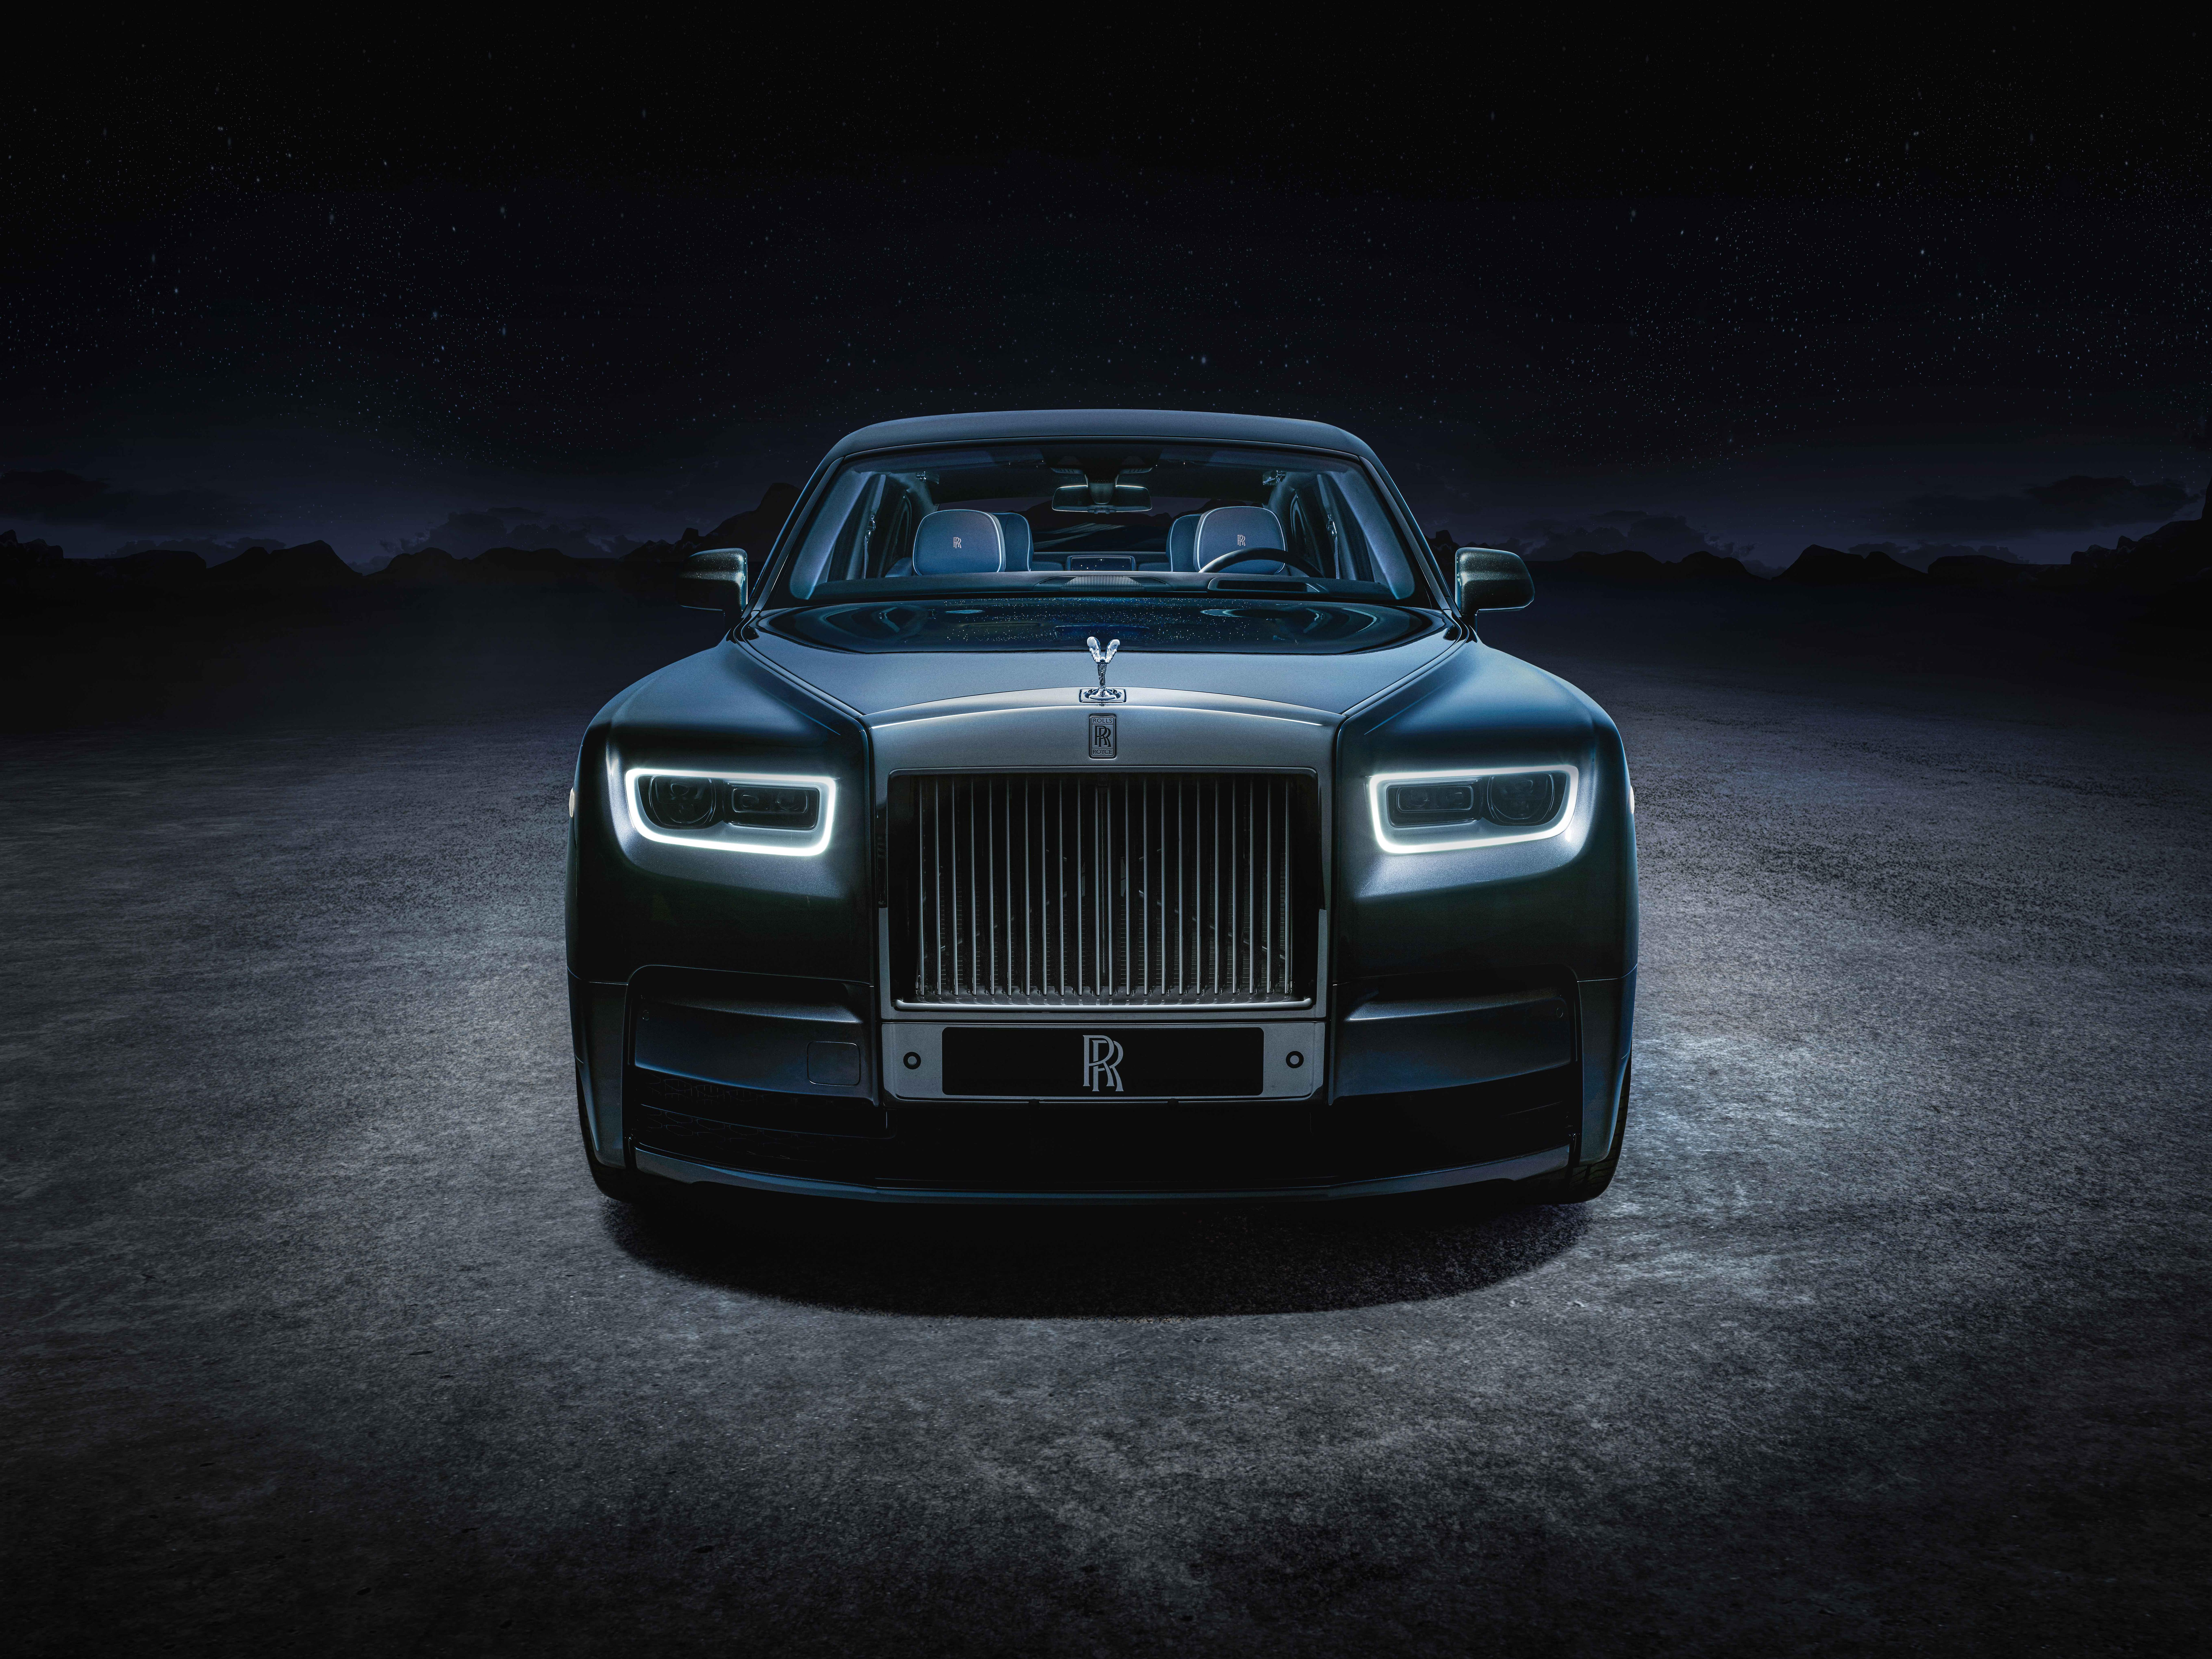 rolls royce phantom ewb tempus collection 2021 4k 1618919463 - Rolls Royce Phantom EWB Tempus Collection 2021 4k - Rolls Royce Phantom EWB Tempus Collection 2021 4k wallpapers